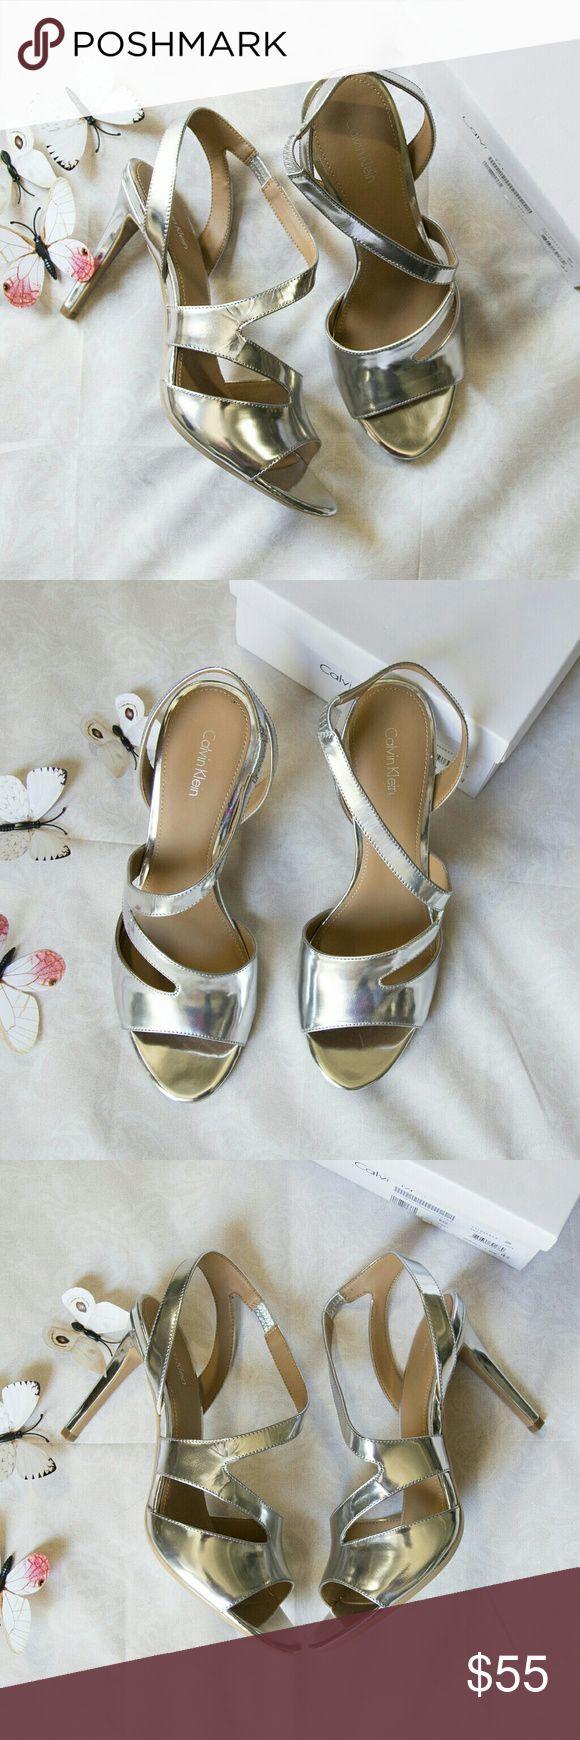 "New CALVIN KLEIN metallic silver sandal heels New in box CALVIN KLEIN sz 10M metallic silver sandal heels MSRP $109  size: 10M color: silver  - Open toe - Cutout detail - Asymmetrical vamp strap - Slip-on - Approx. 4.75"" heel - Imported Calvin Klein Shoes Heels"